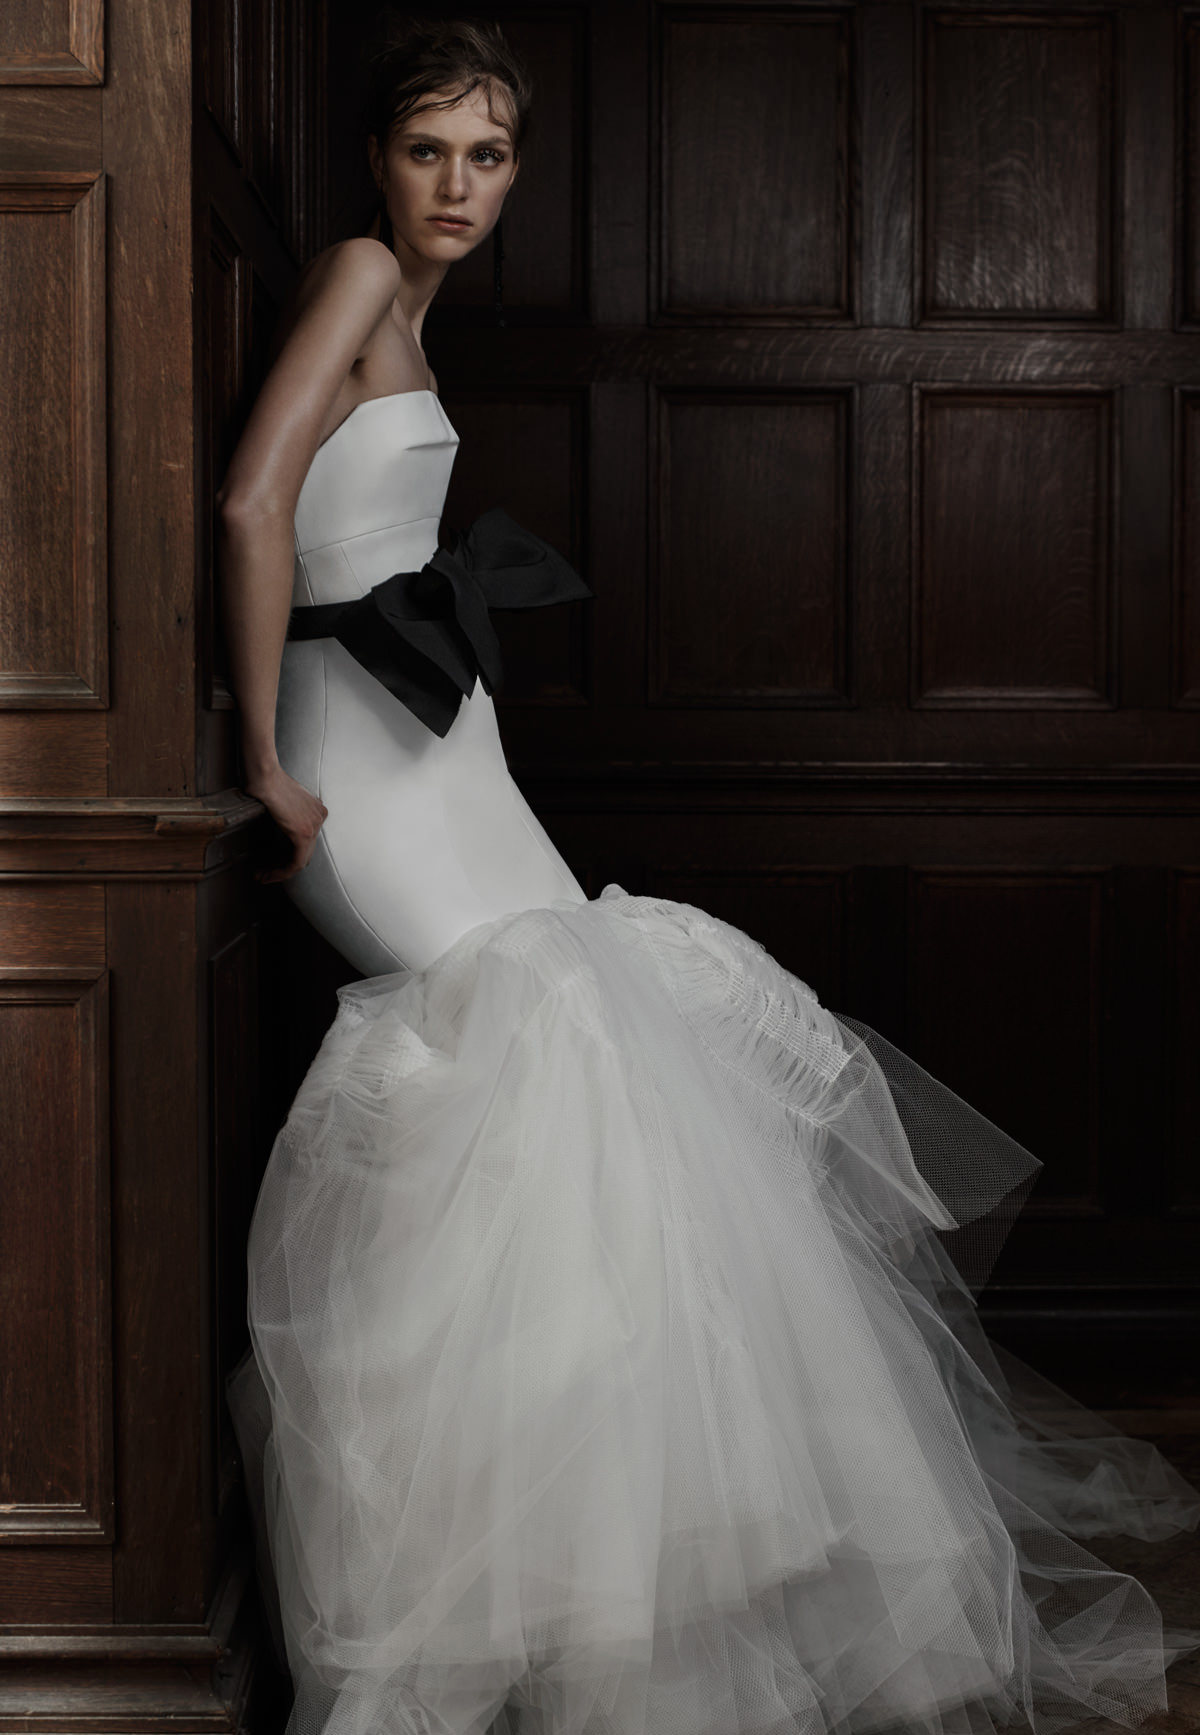 e8767eb241b7 VERA WANG WEEK LONG SAMPLE SALE - Browns Bride